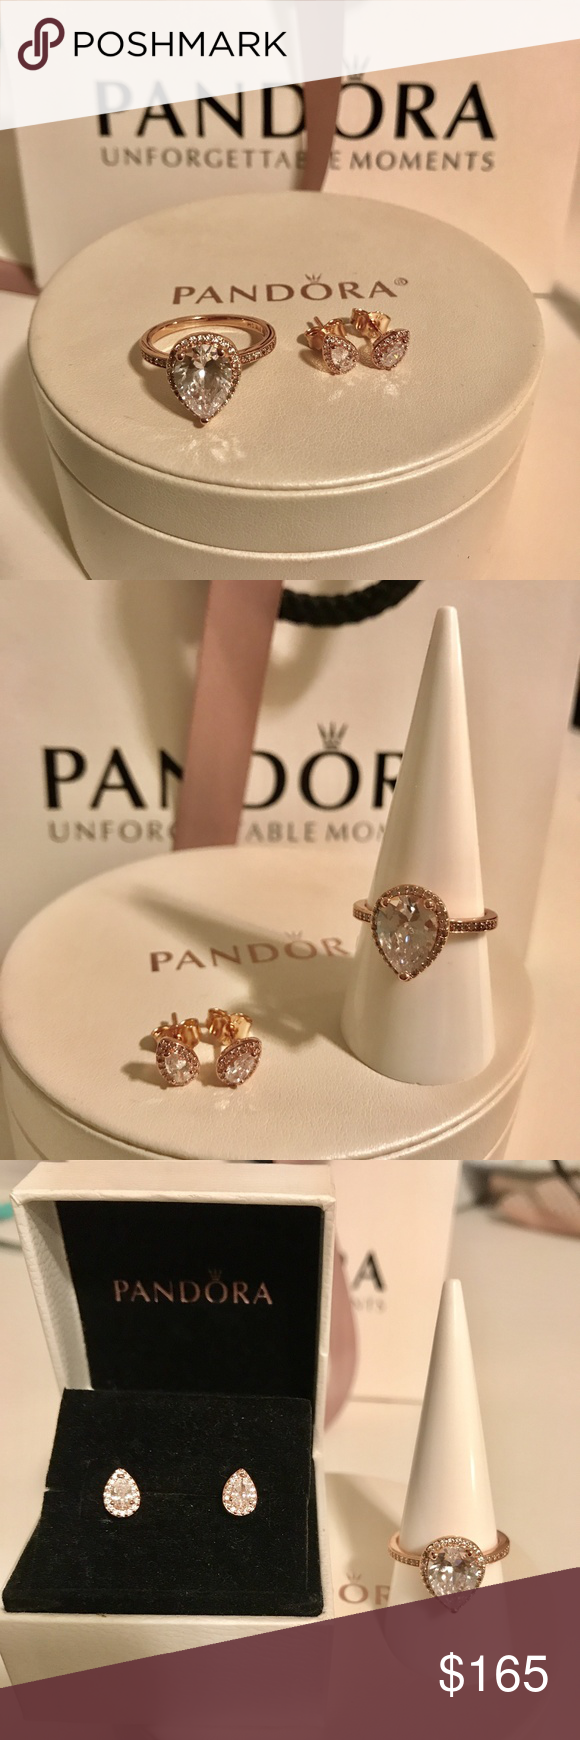 eadf6d248 Pandora Rose Radiant Teardrop Ring & Earrings Set Pandora Rose Radiant  Teardrop Ring &